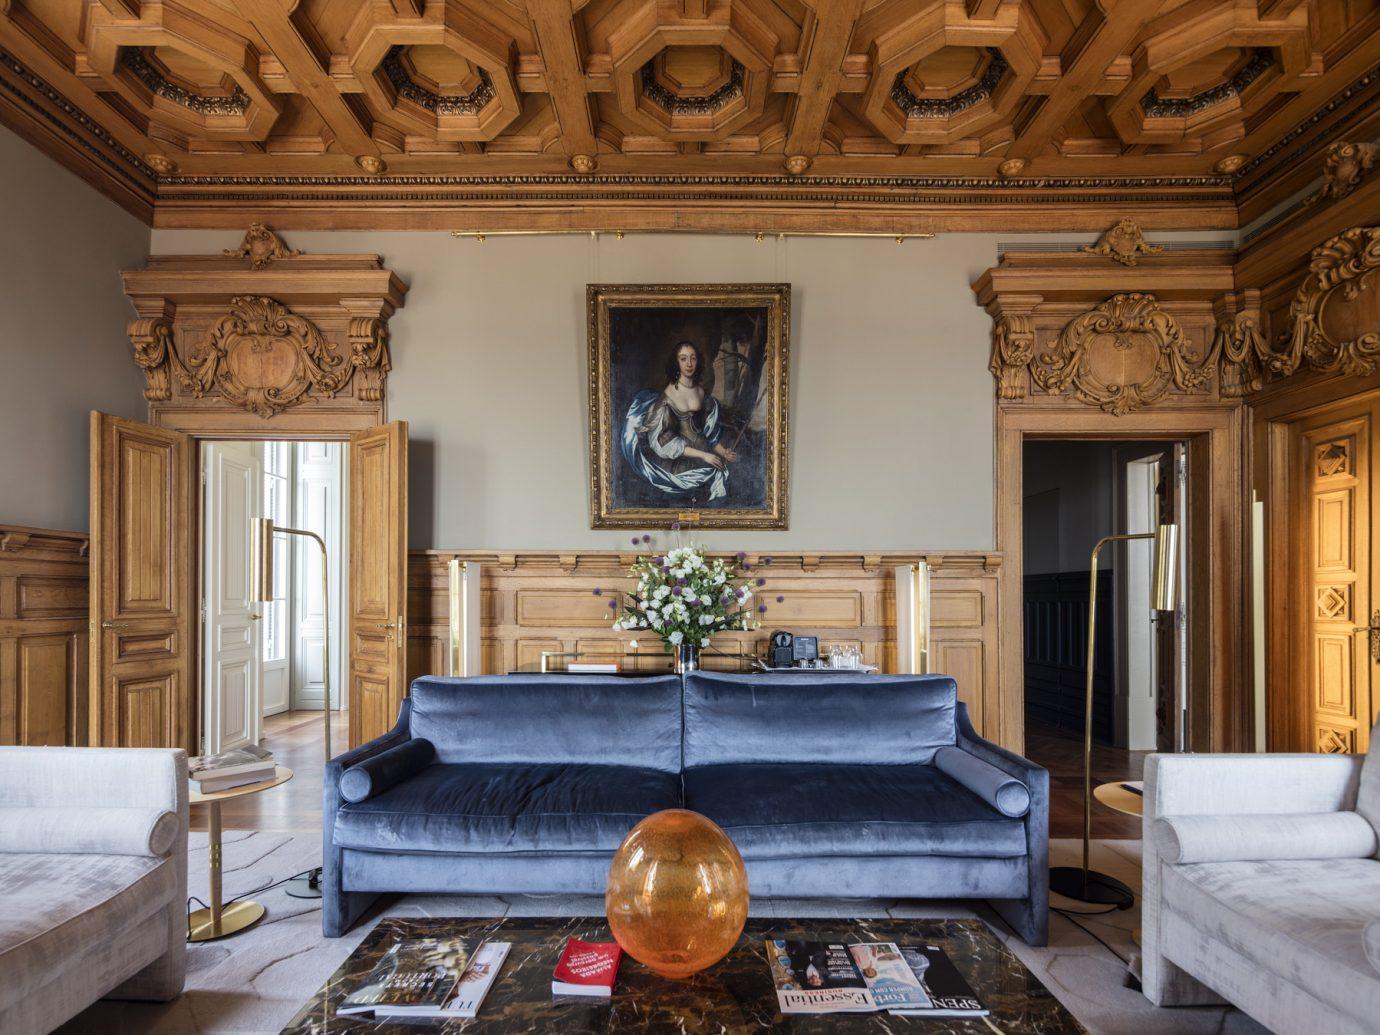 Luxurious interior space with blue velvet couch at Verride Palácio Santa Catarina